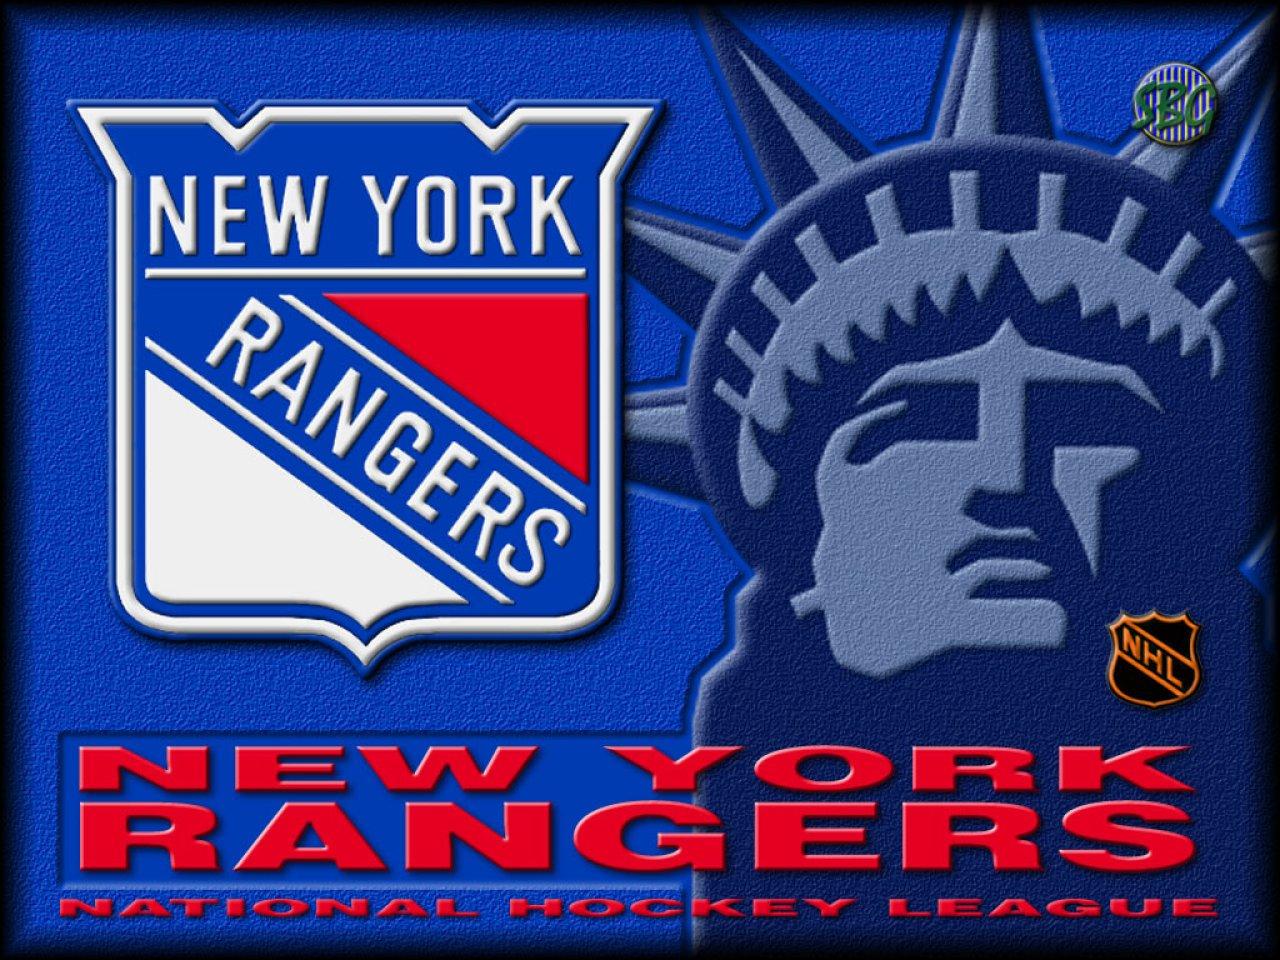 Ny Rangers Wallpaper Nhl   new york rangers 1280x960